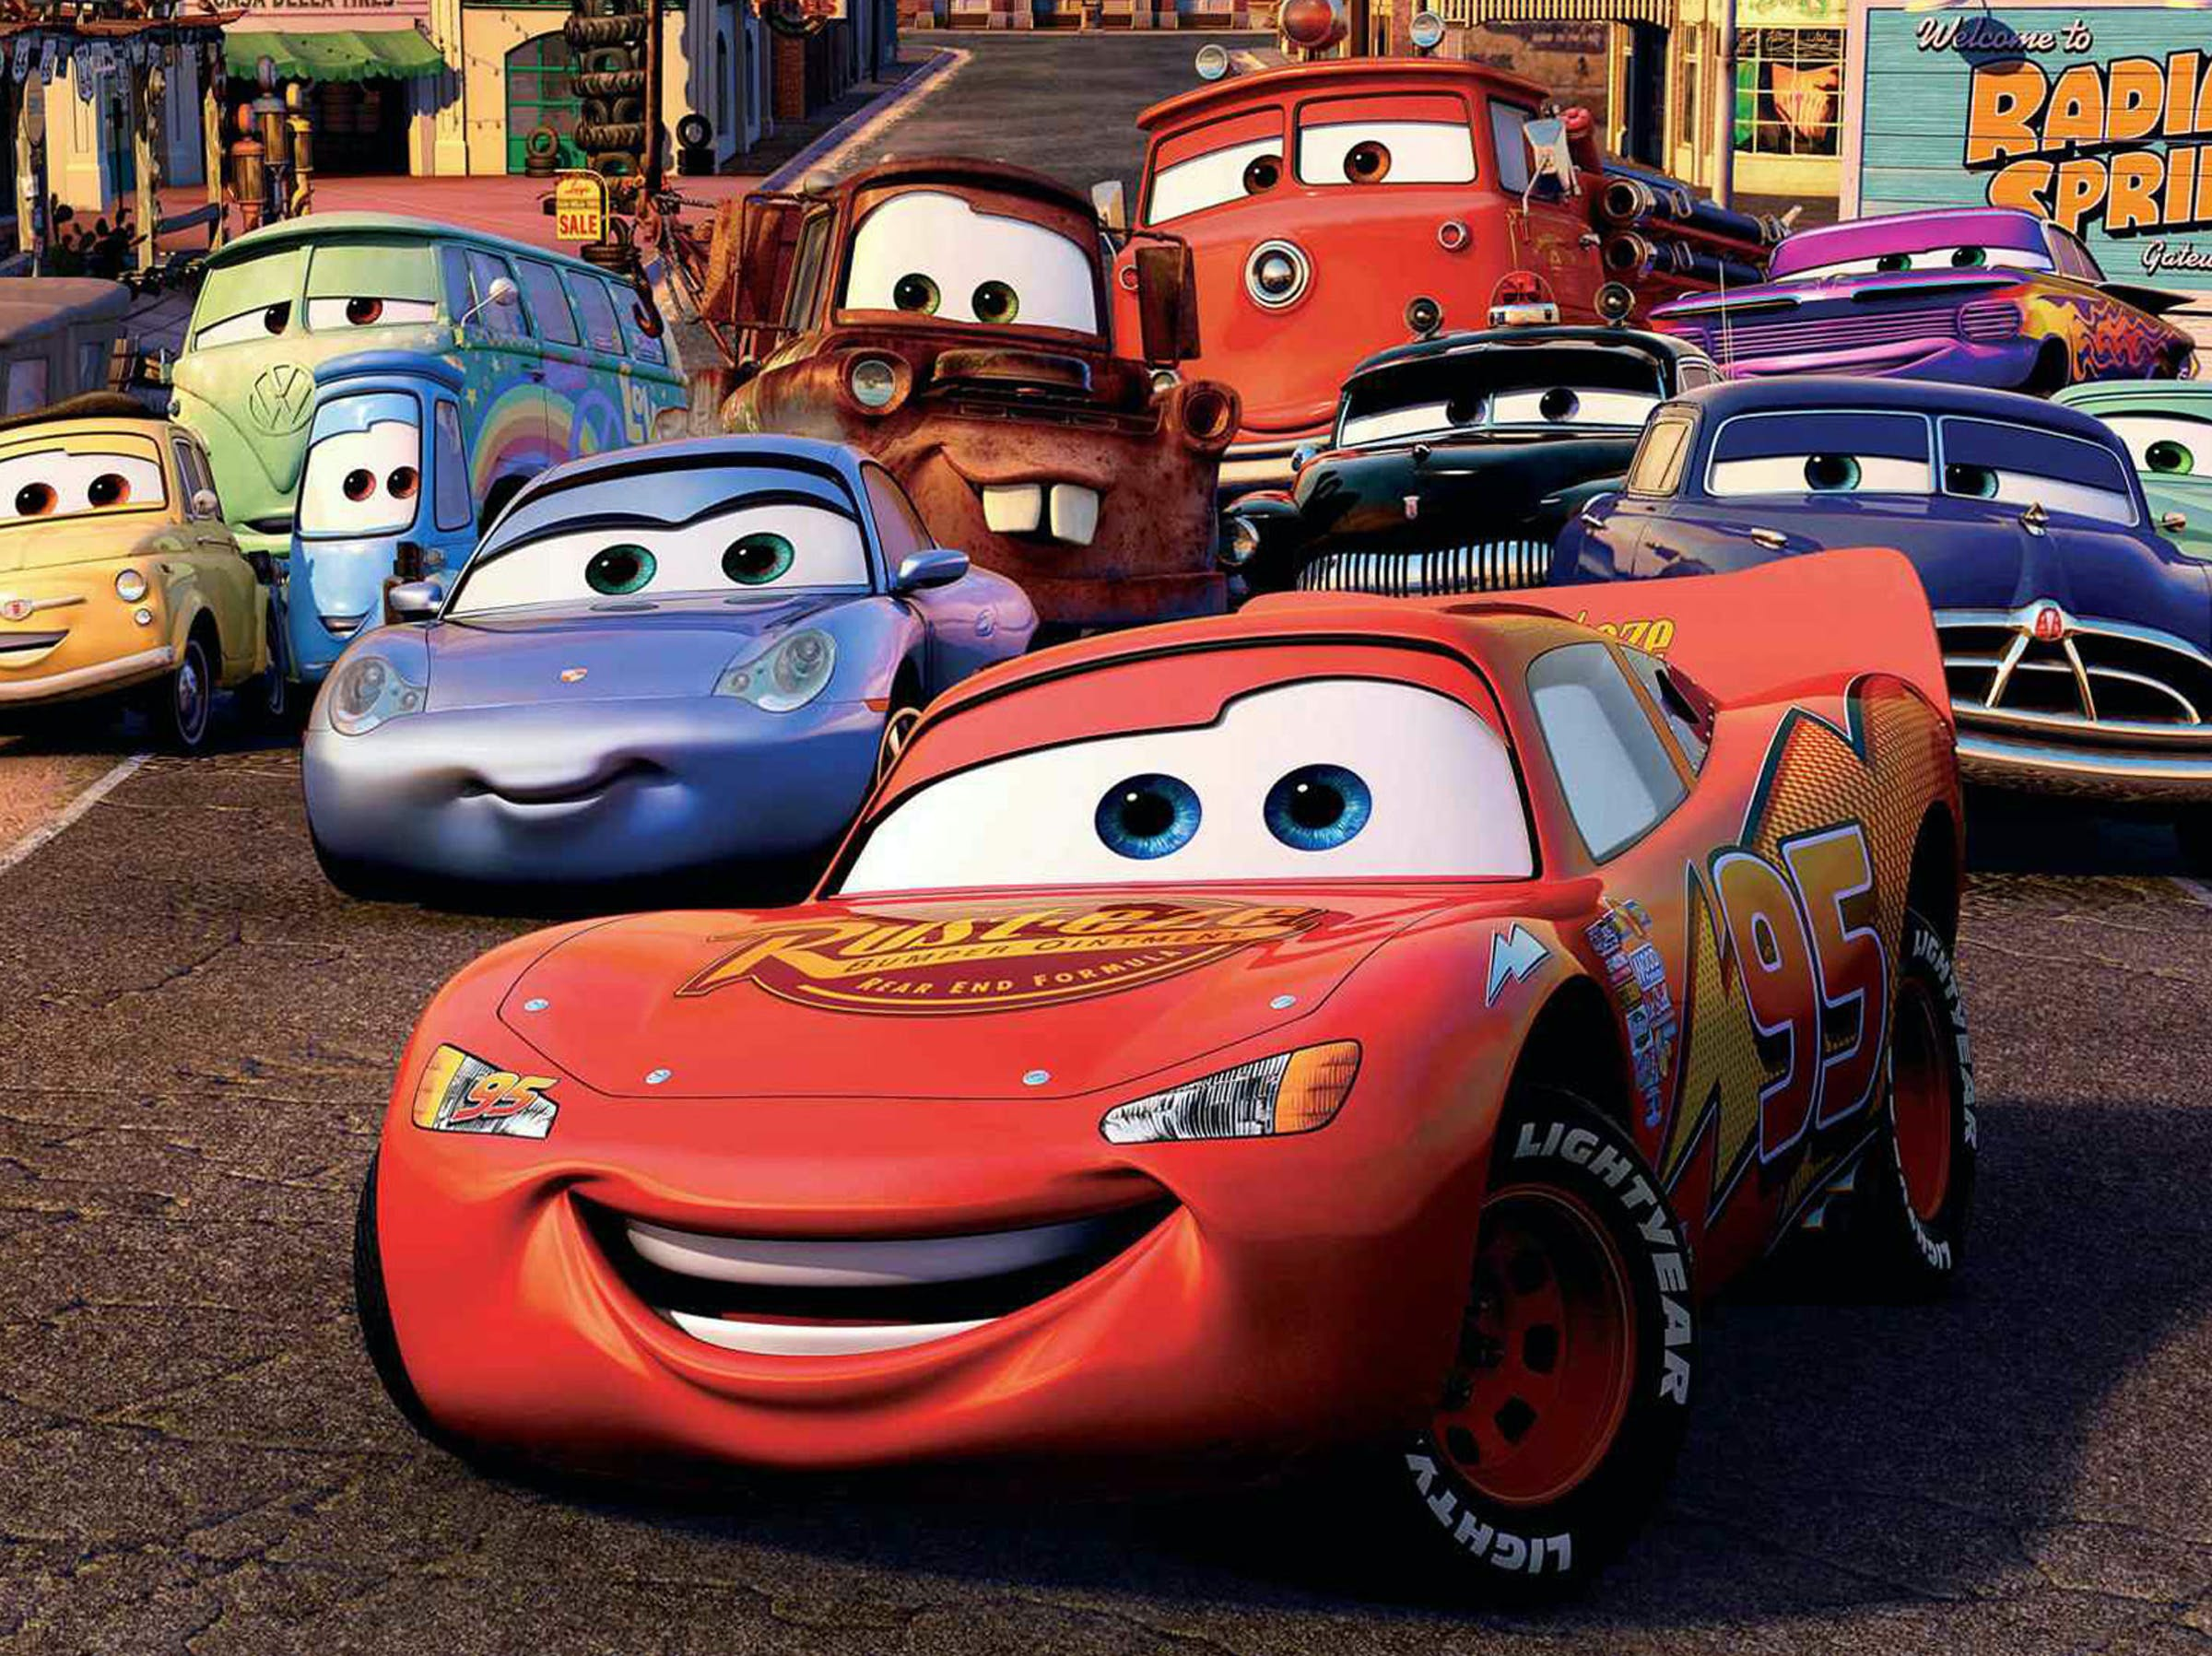 cars disney movie pixar fandom cosplay mcqueen lightning believe fan fans adult isney inside unexpected rect teens